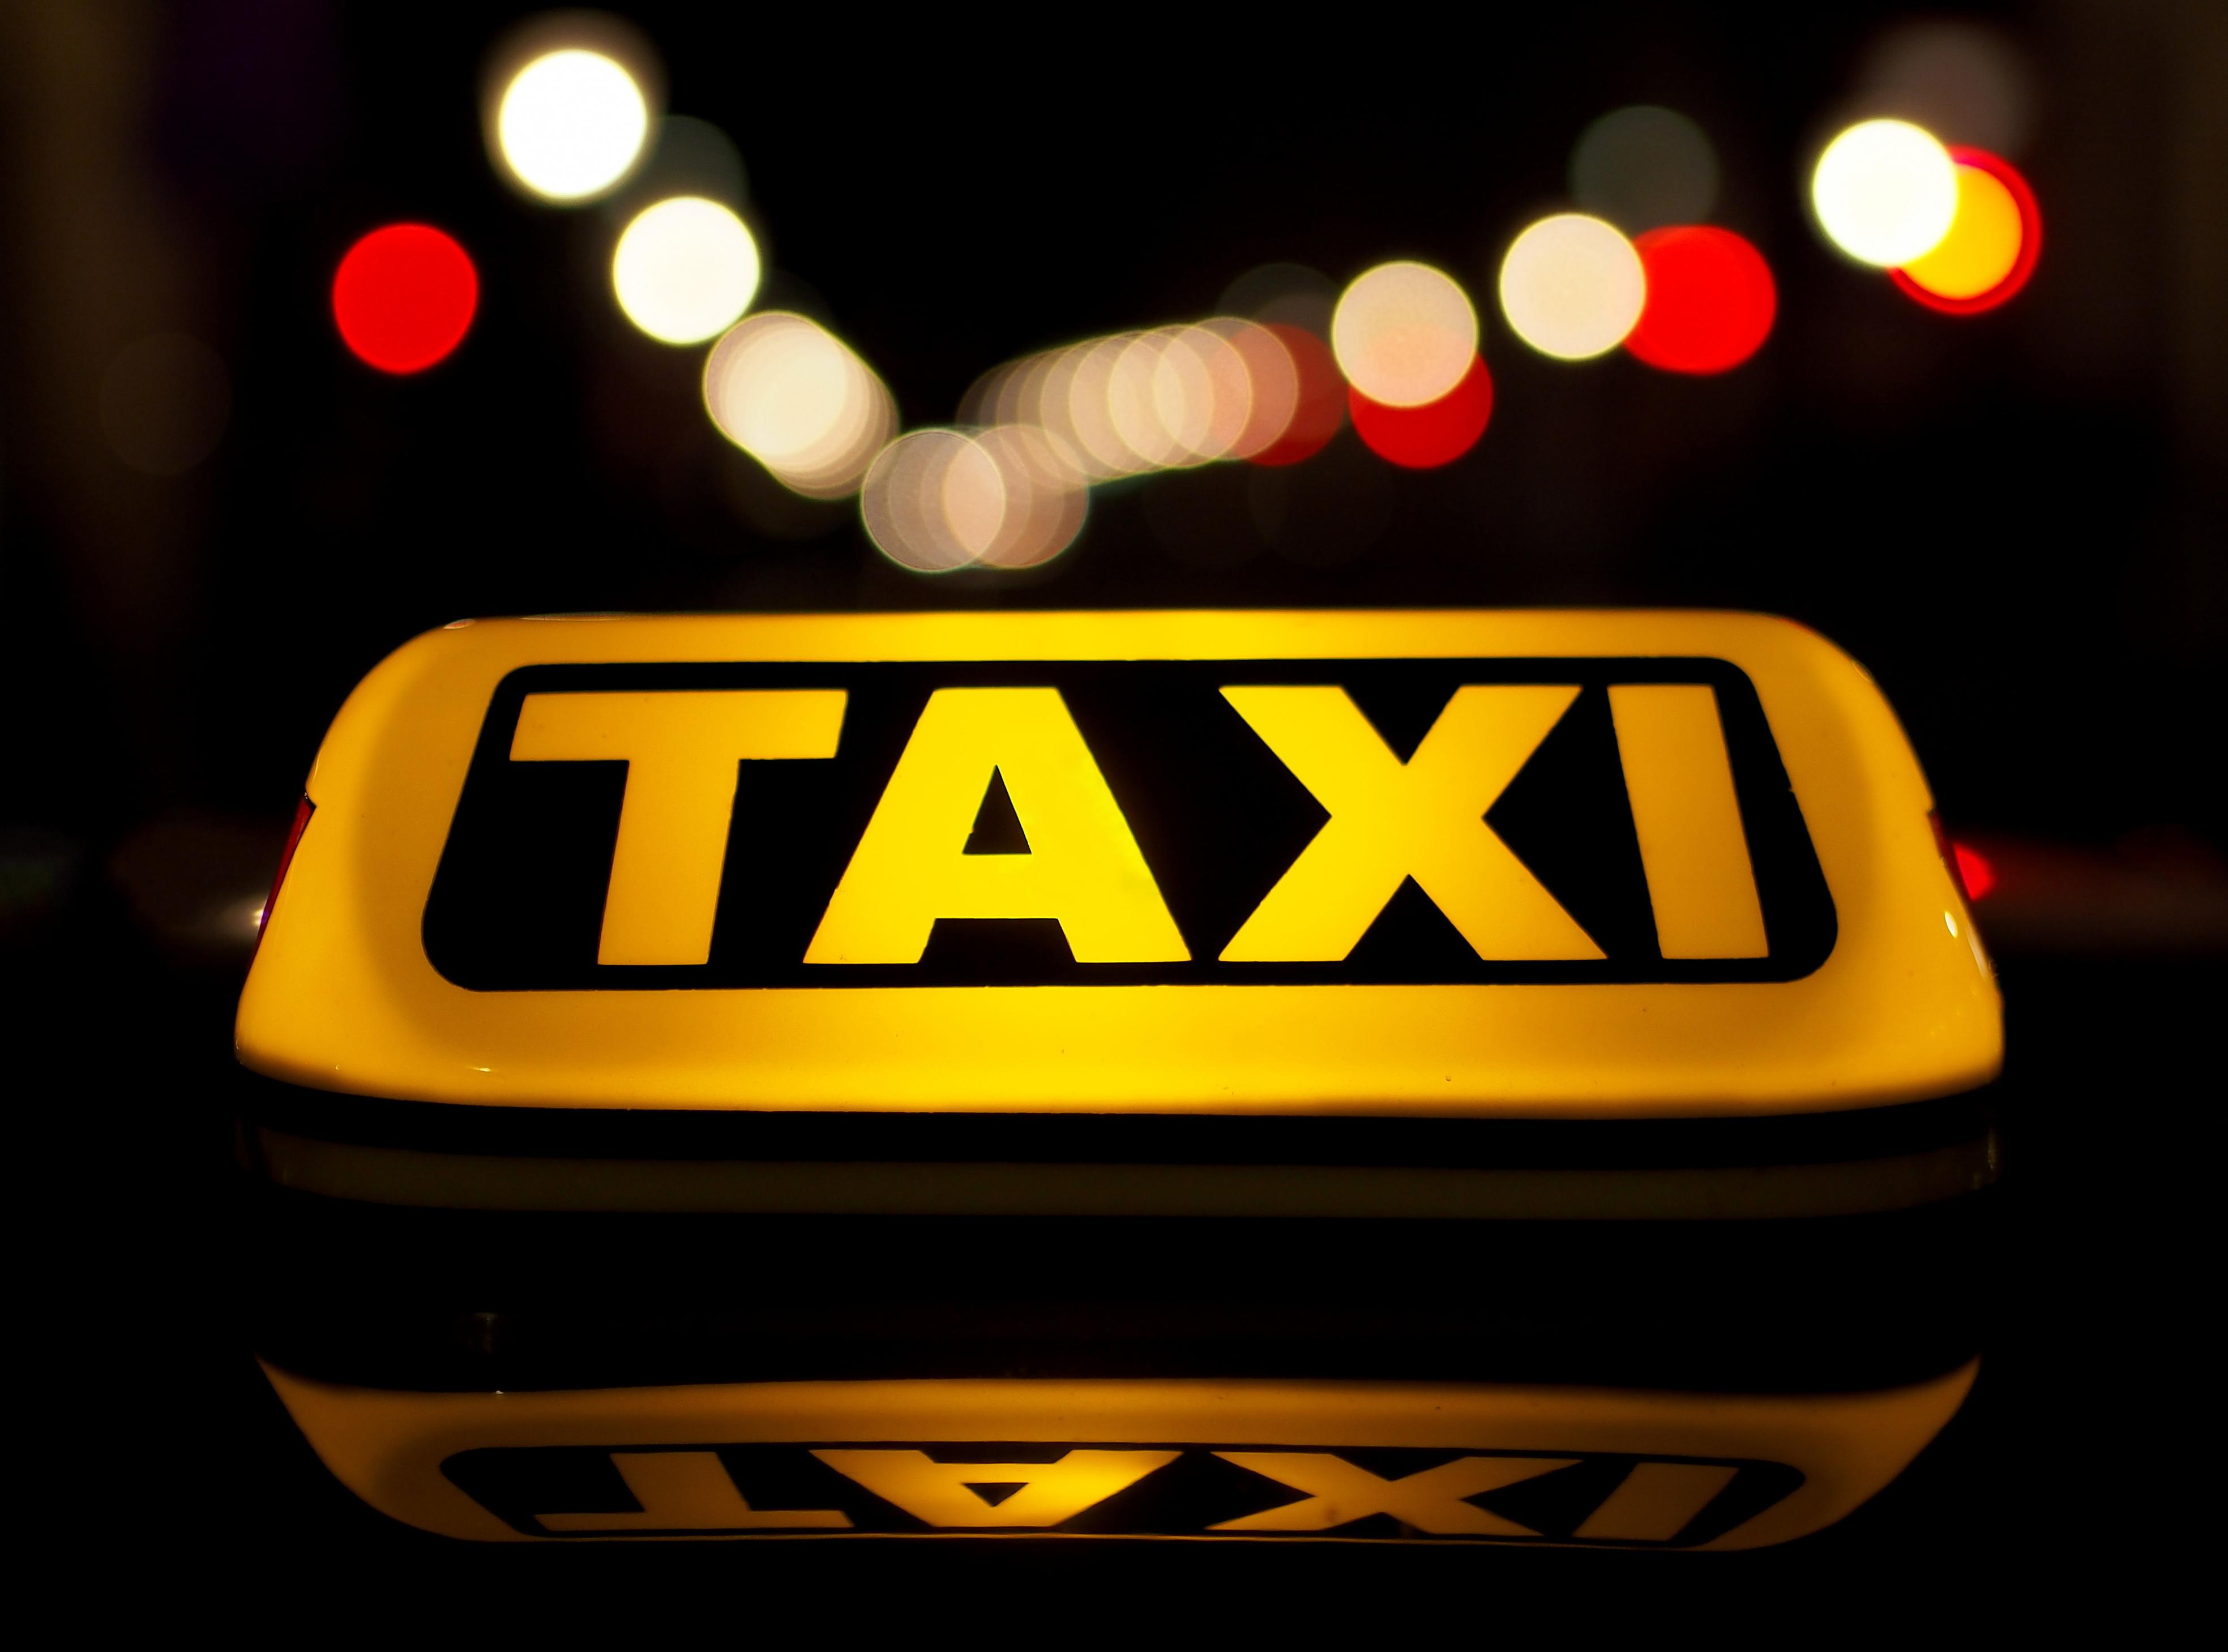 Оперативная и надежная московская служба такси